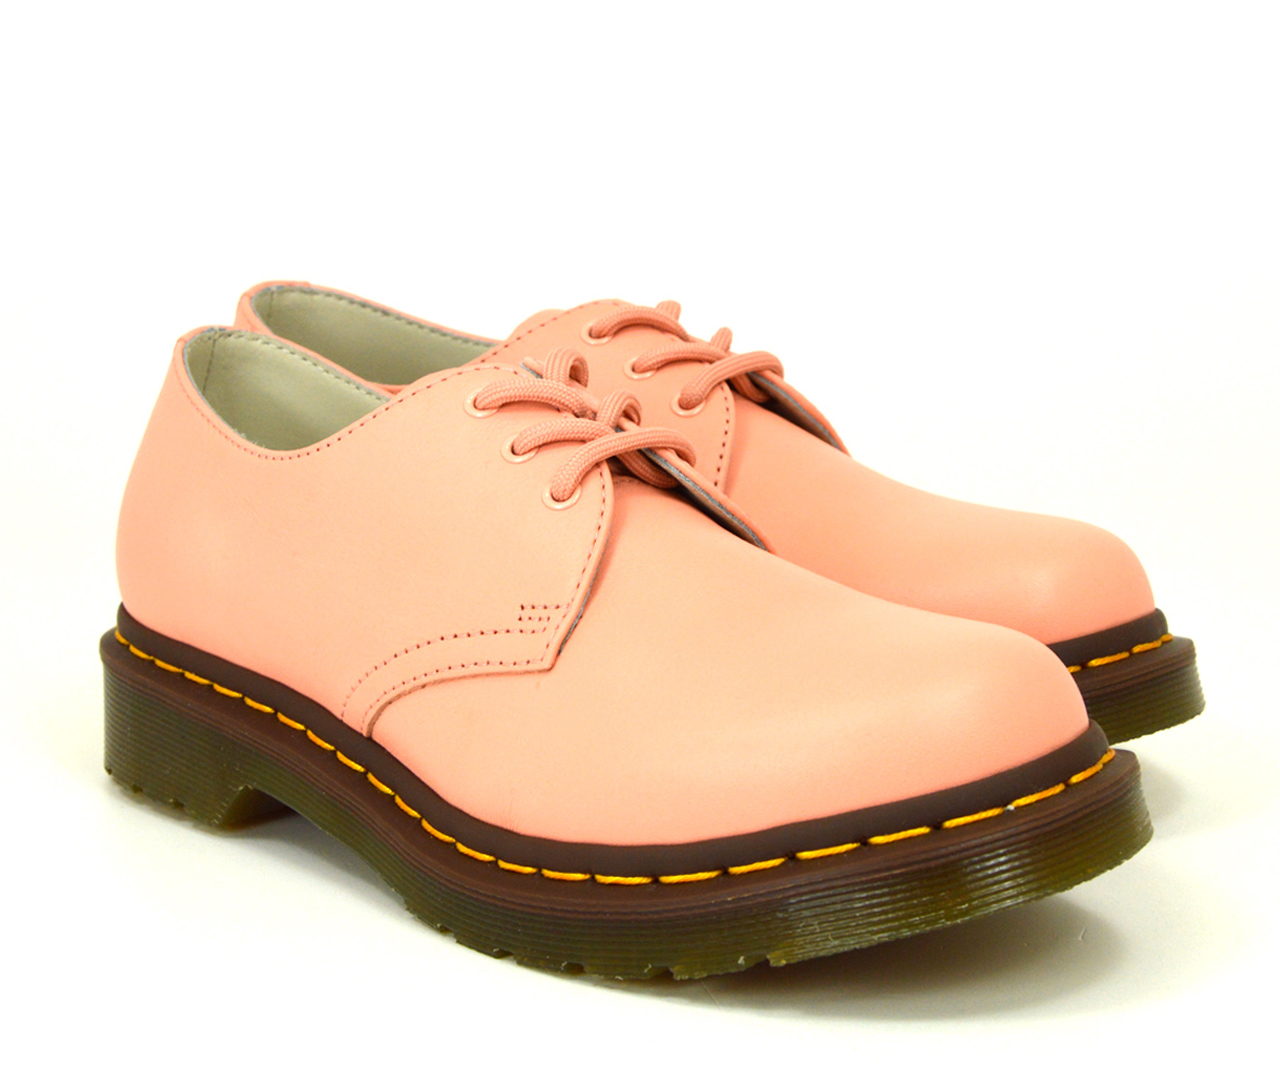 Dr. Martens - 1461 - Salmon Pink Virginia